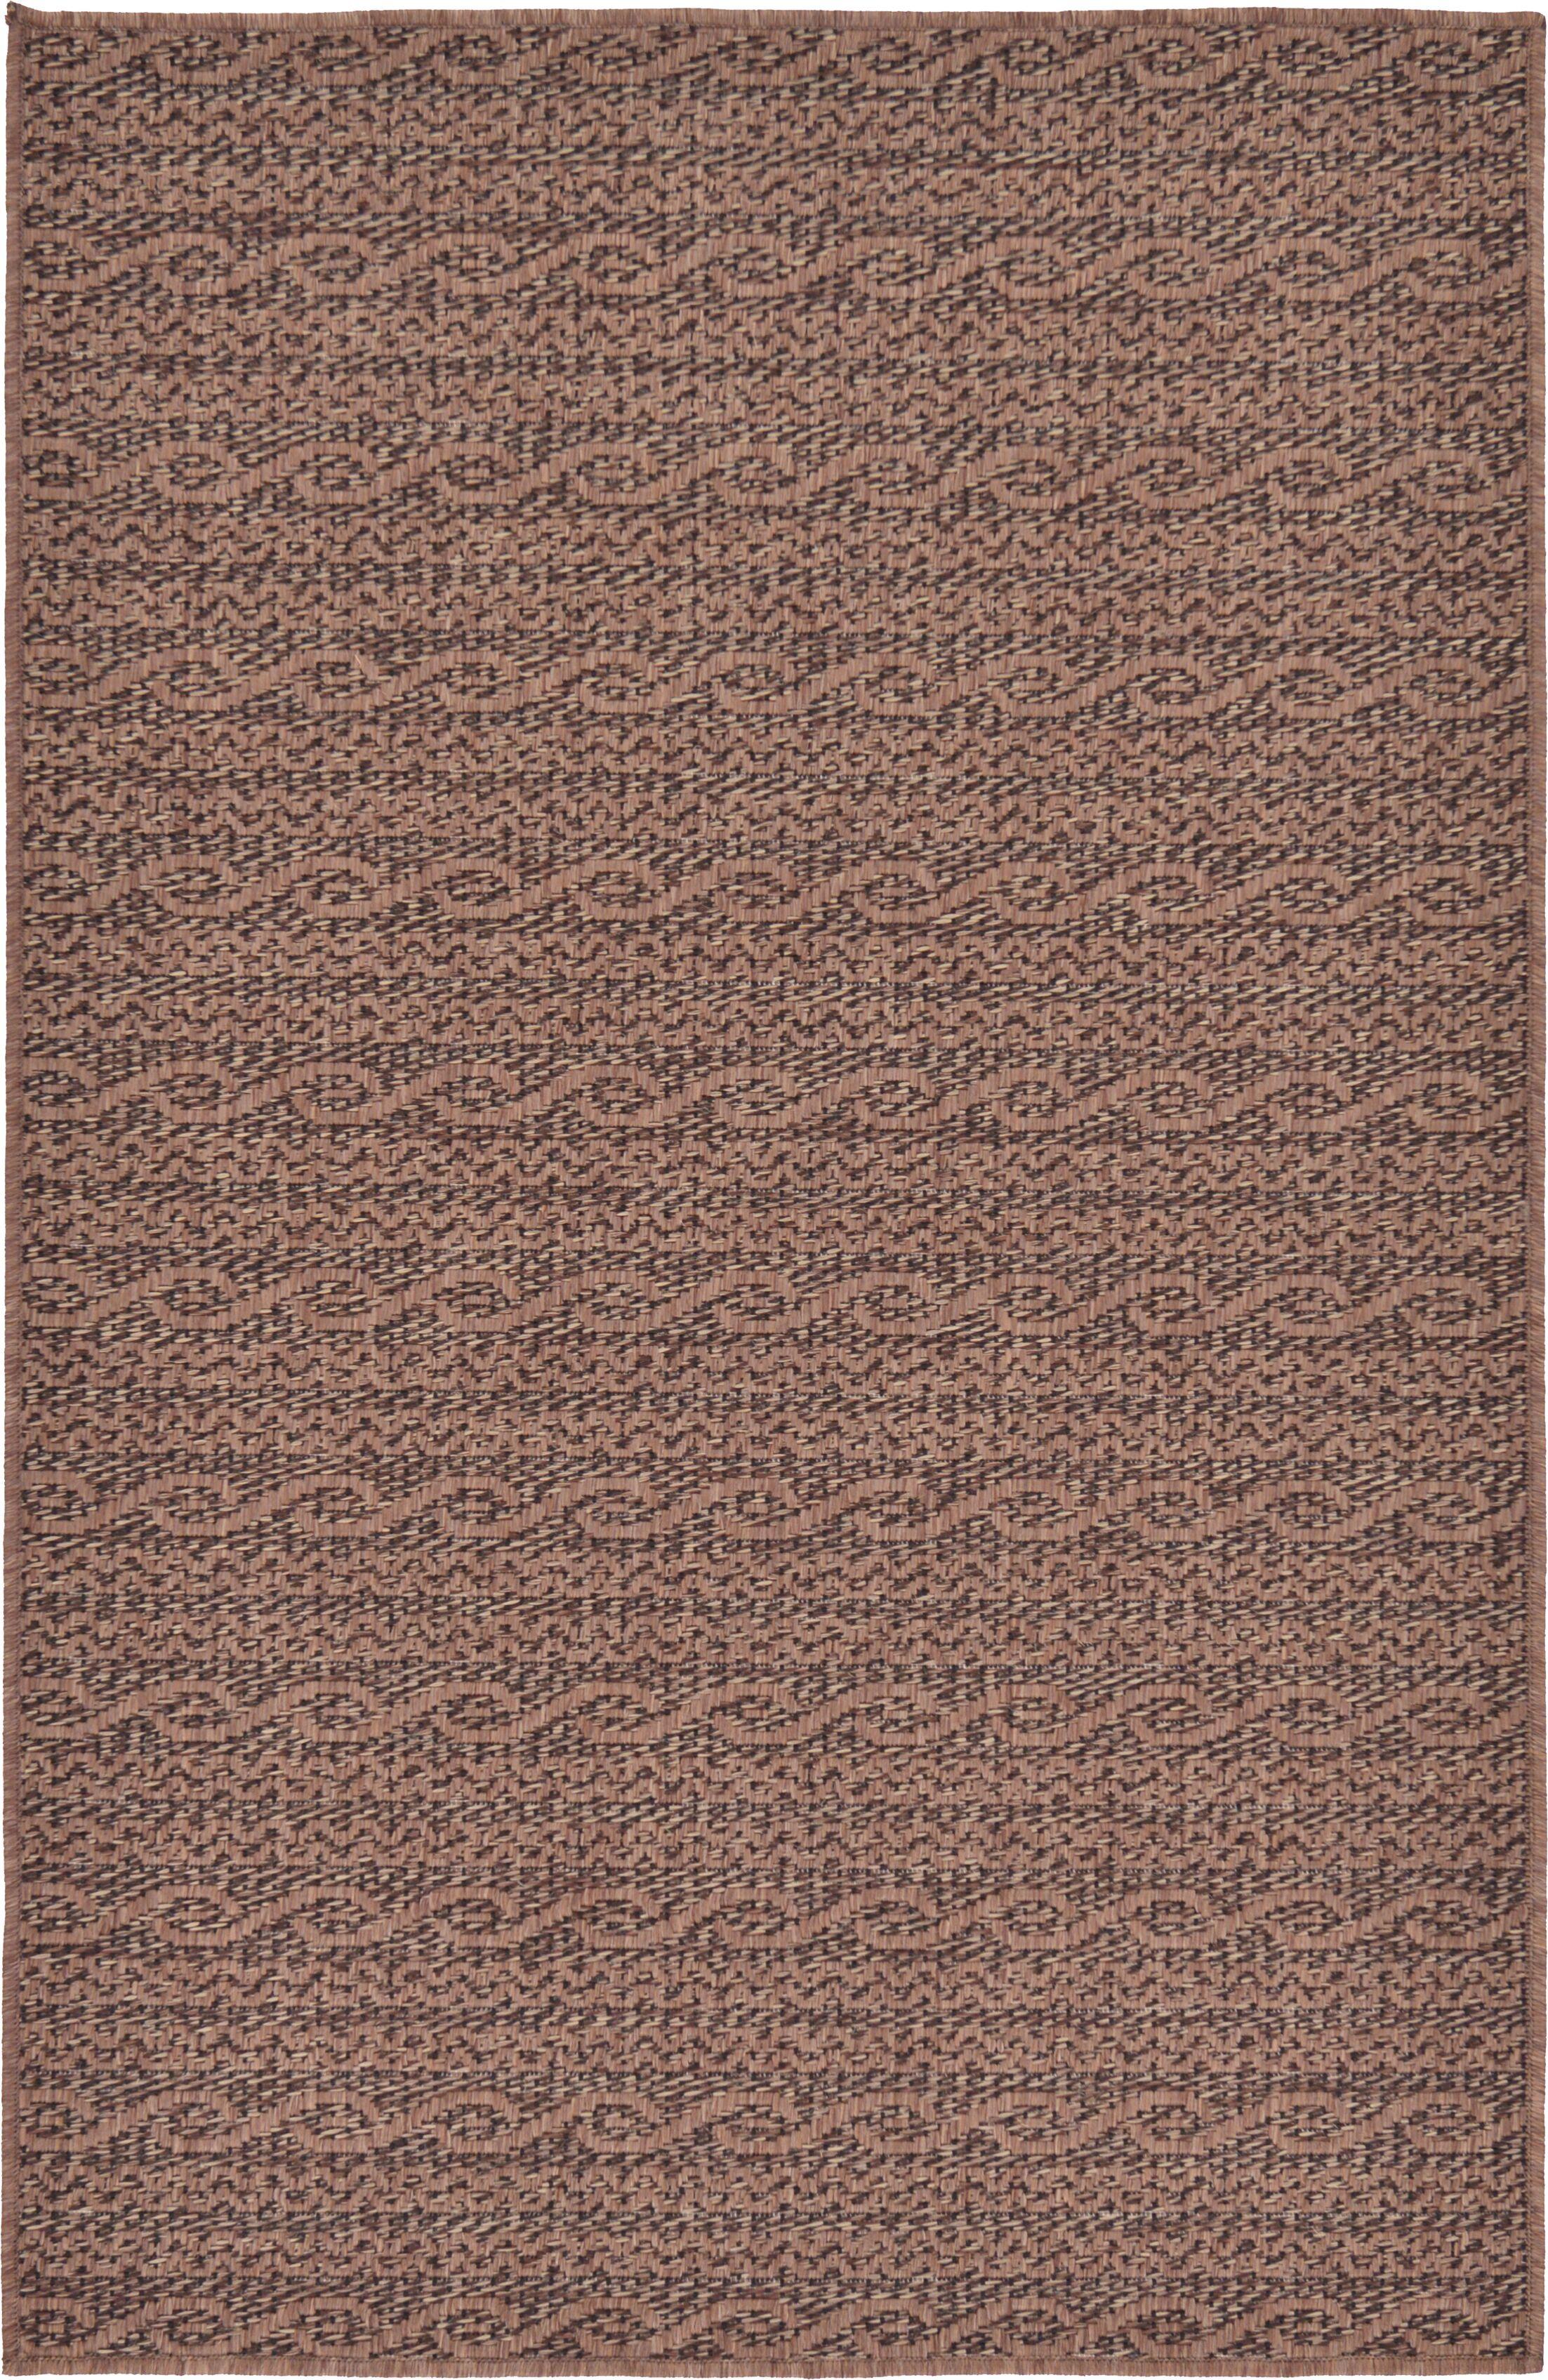 Robbinston Brown Outdoor Area Rug Rug Size: Rectangle 3'3